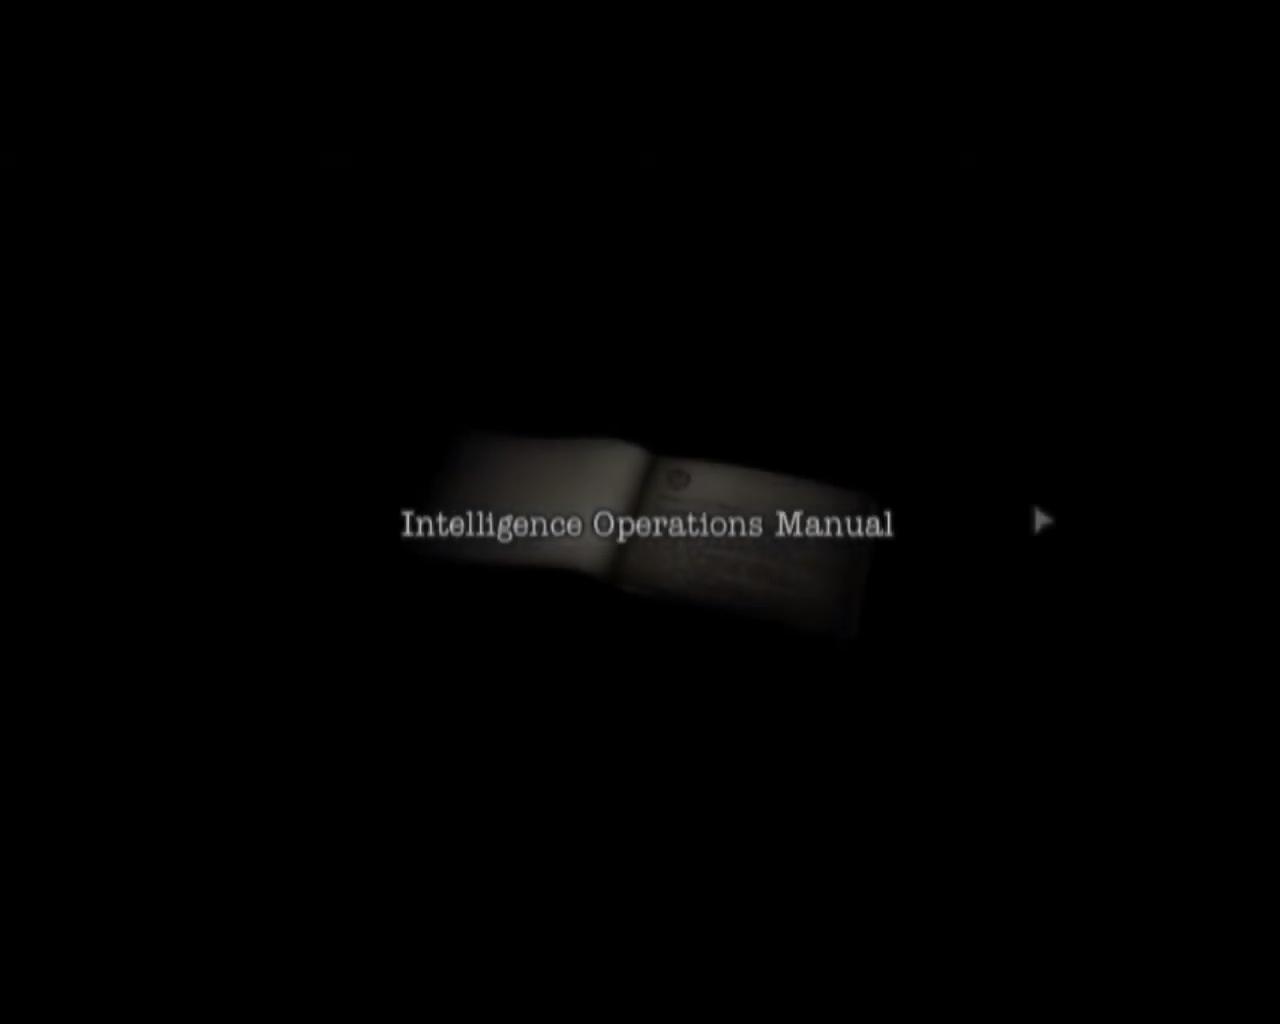 Intelligence Operations Manual